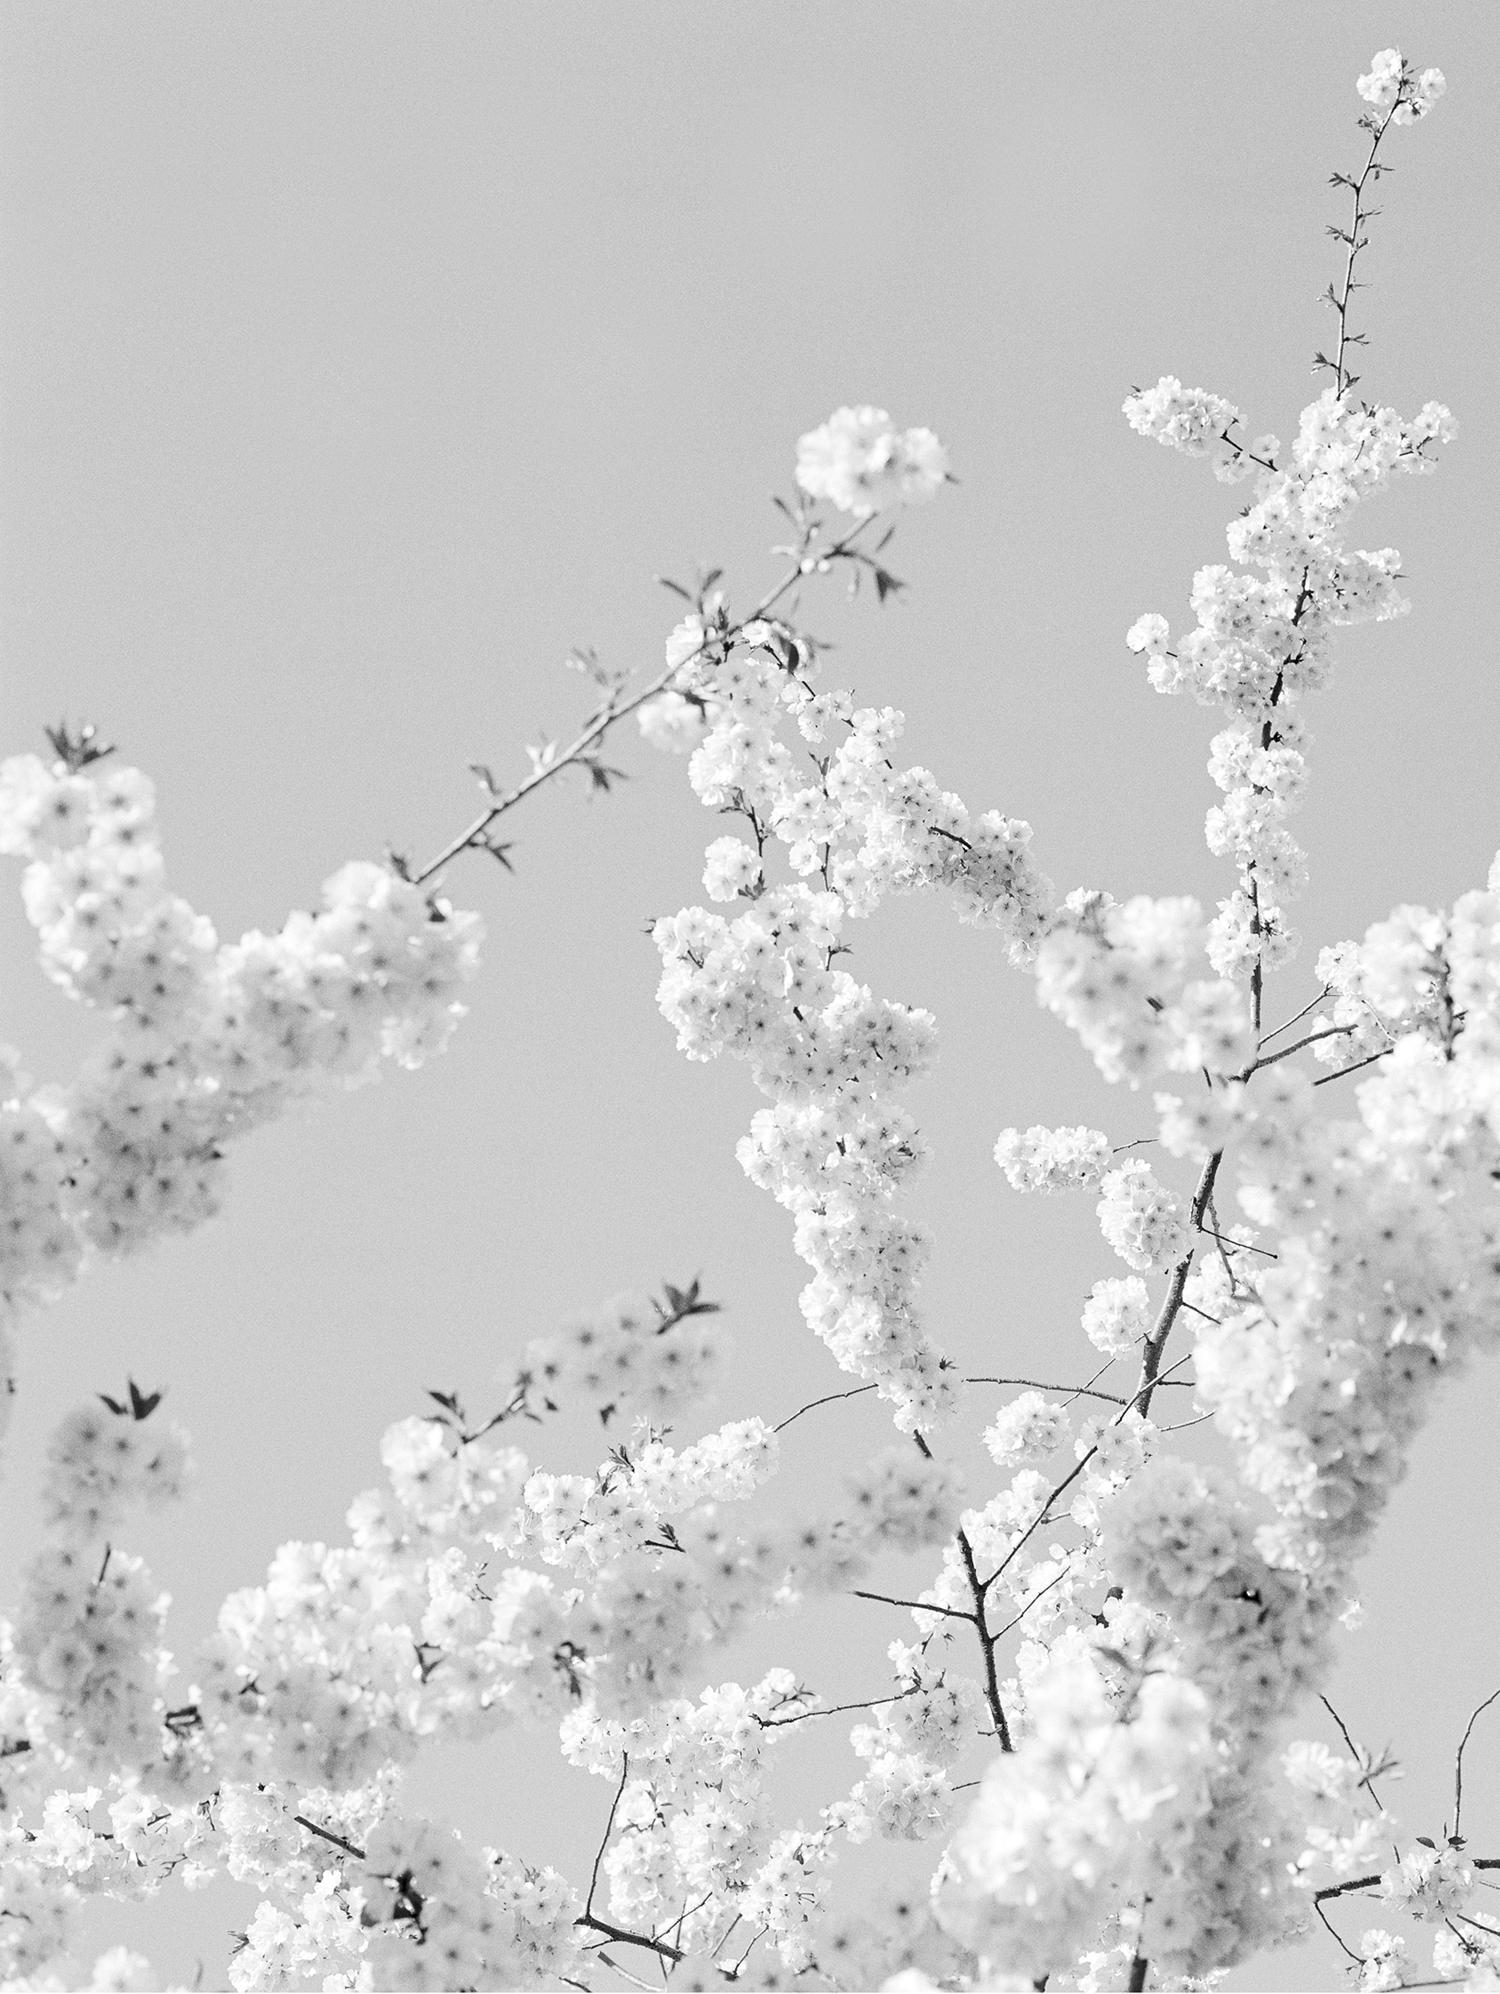 © Loredana Nemes, Blossom, BZ02 2012 in Ludwigsburg Tryptich (a)